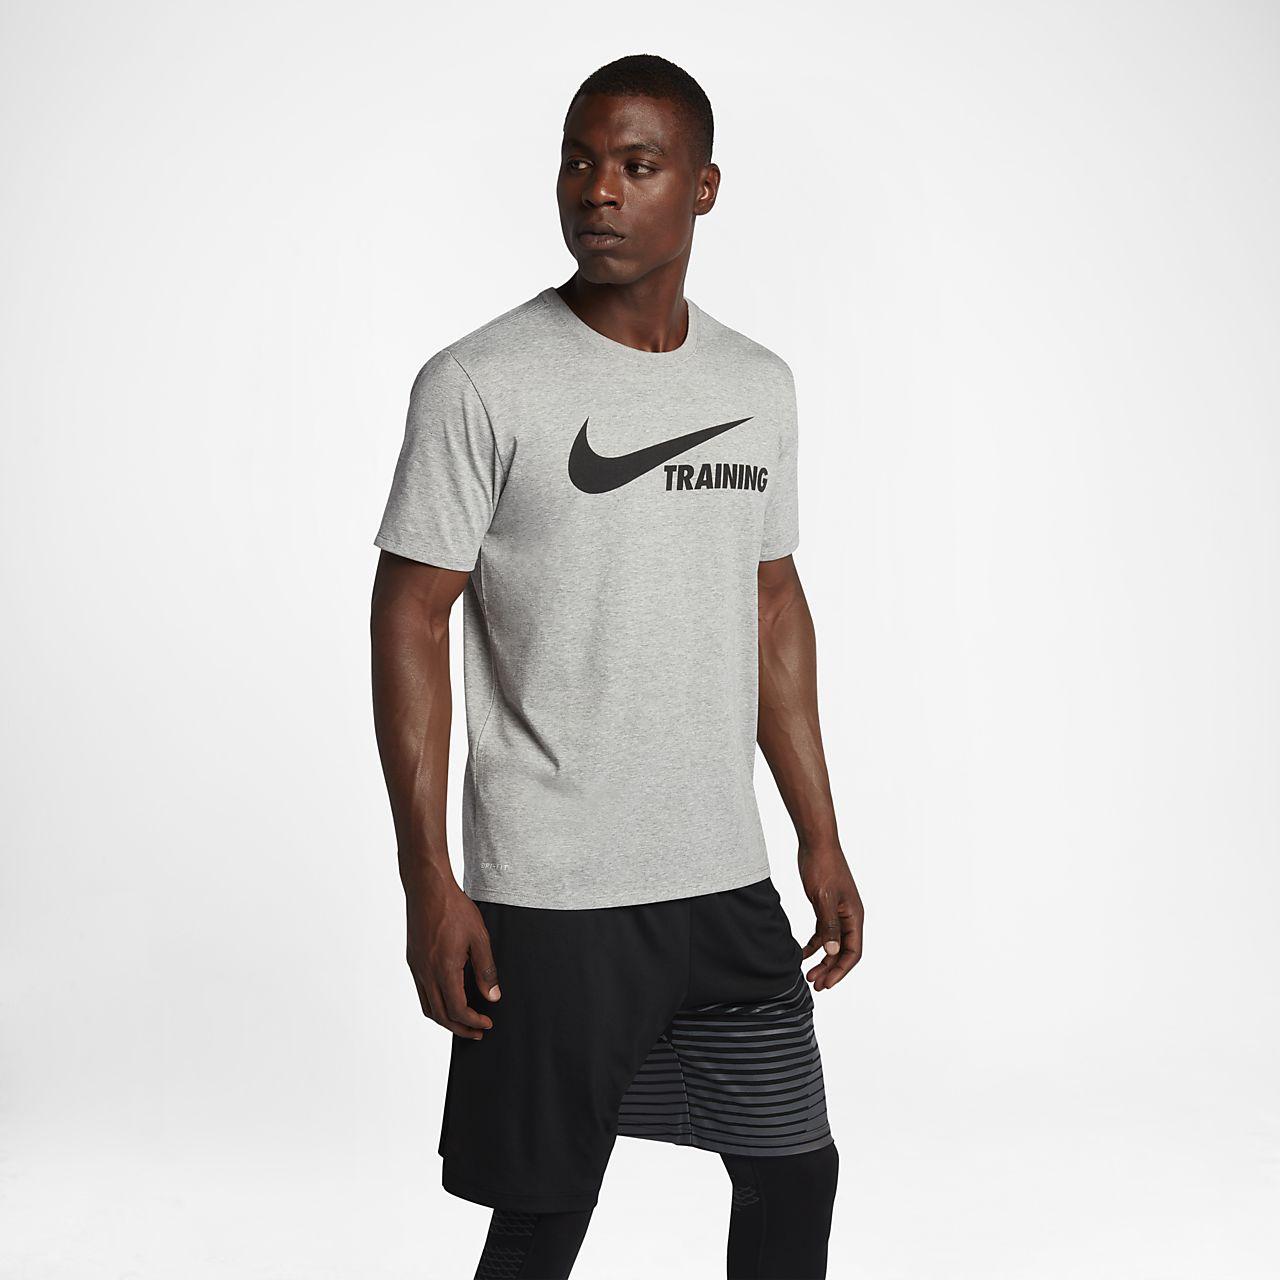 f7ad0eb44b Nike Training Shirt - Best Train 2018